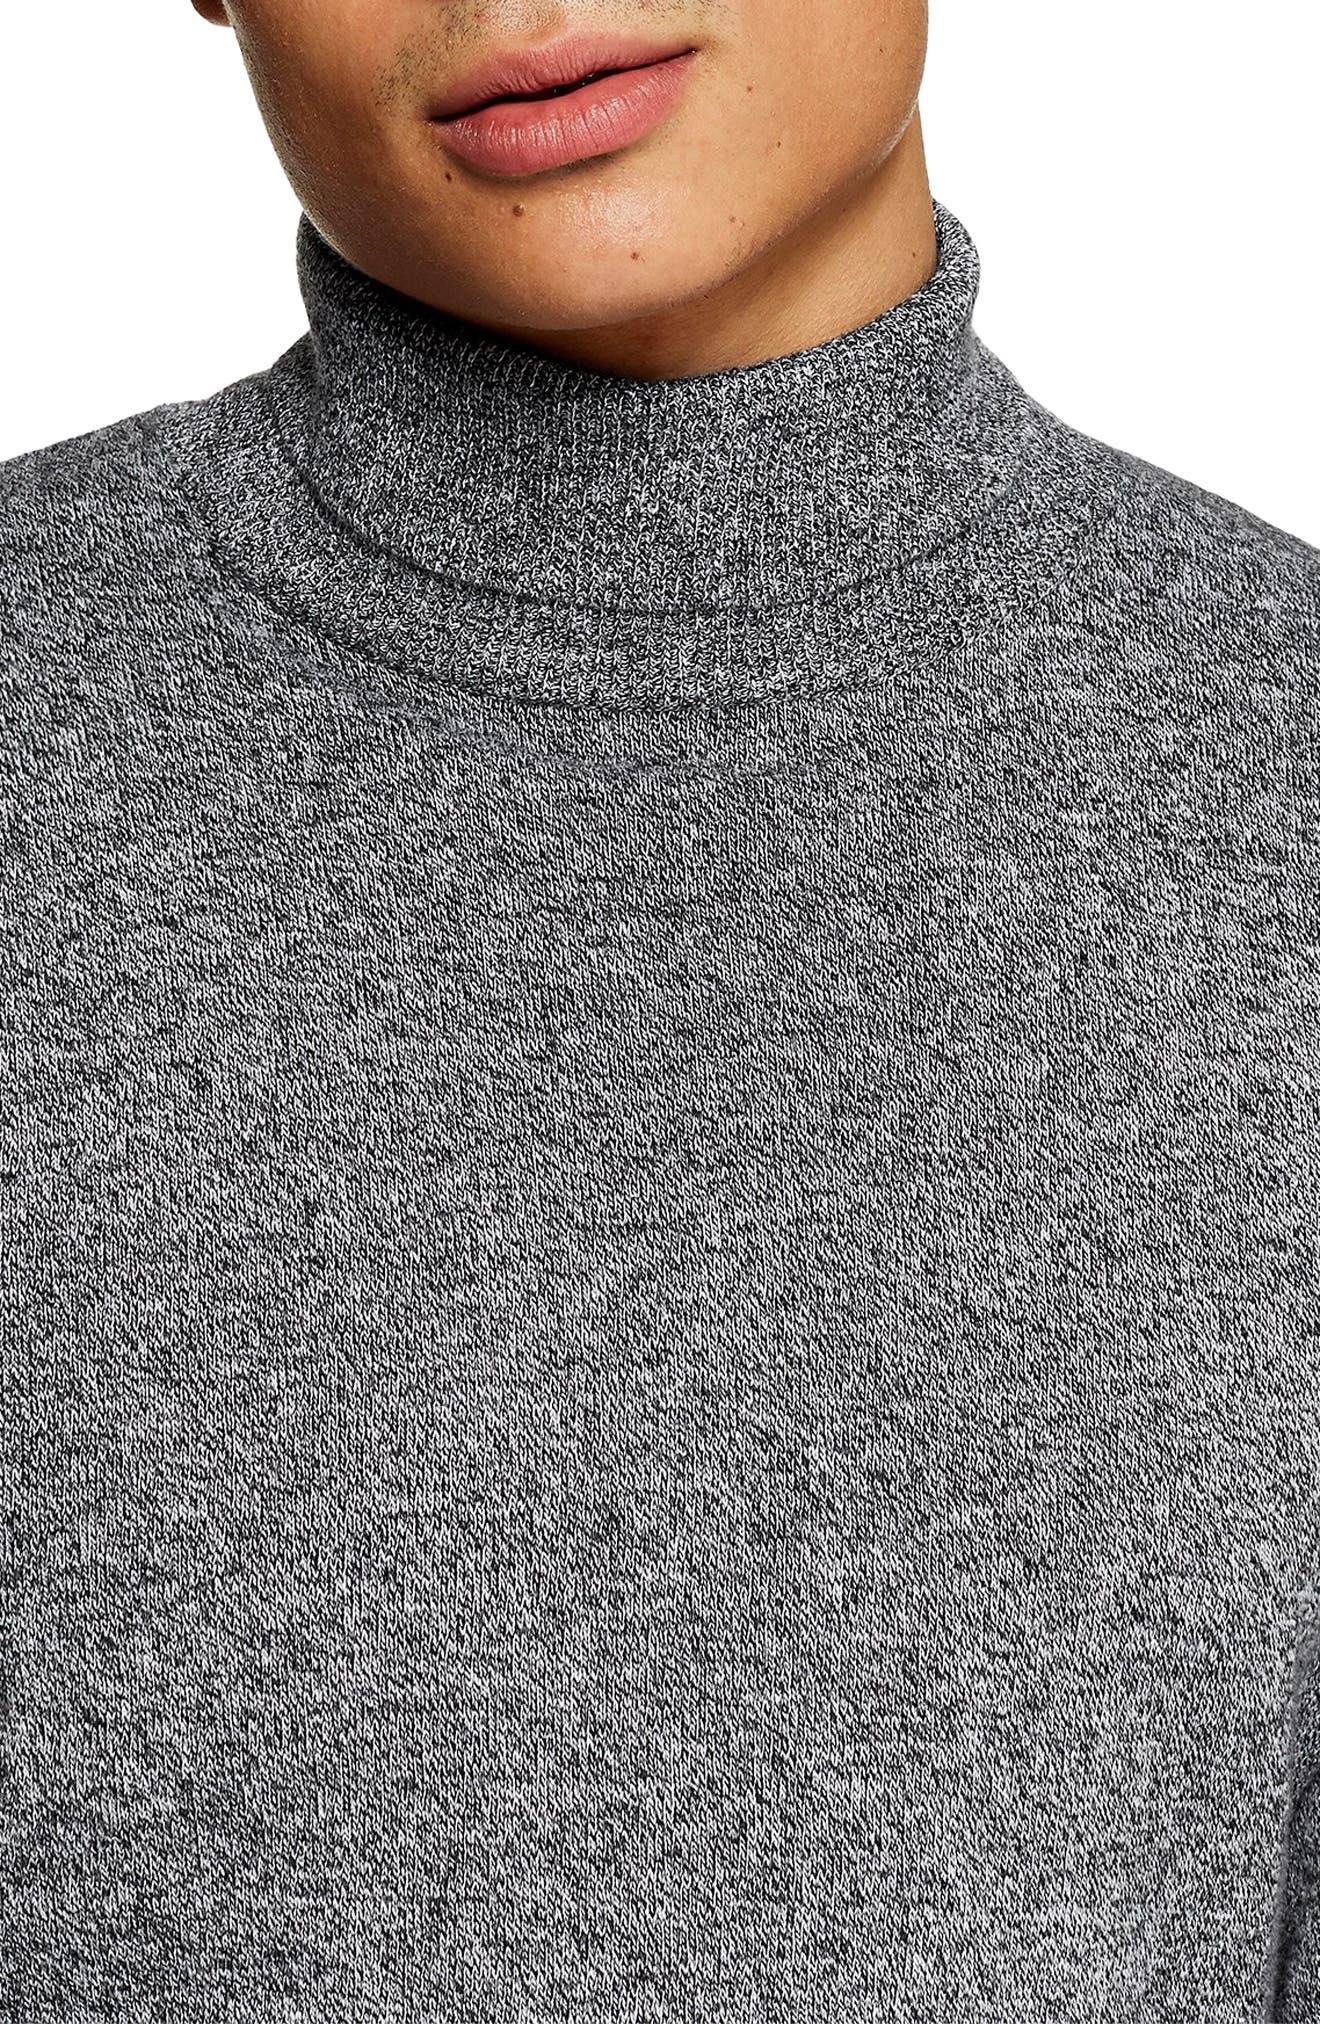 Classic Fit Turtleneck Sweater,                             Alternate thumbnail 3, color,                             020